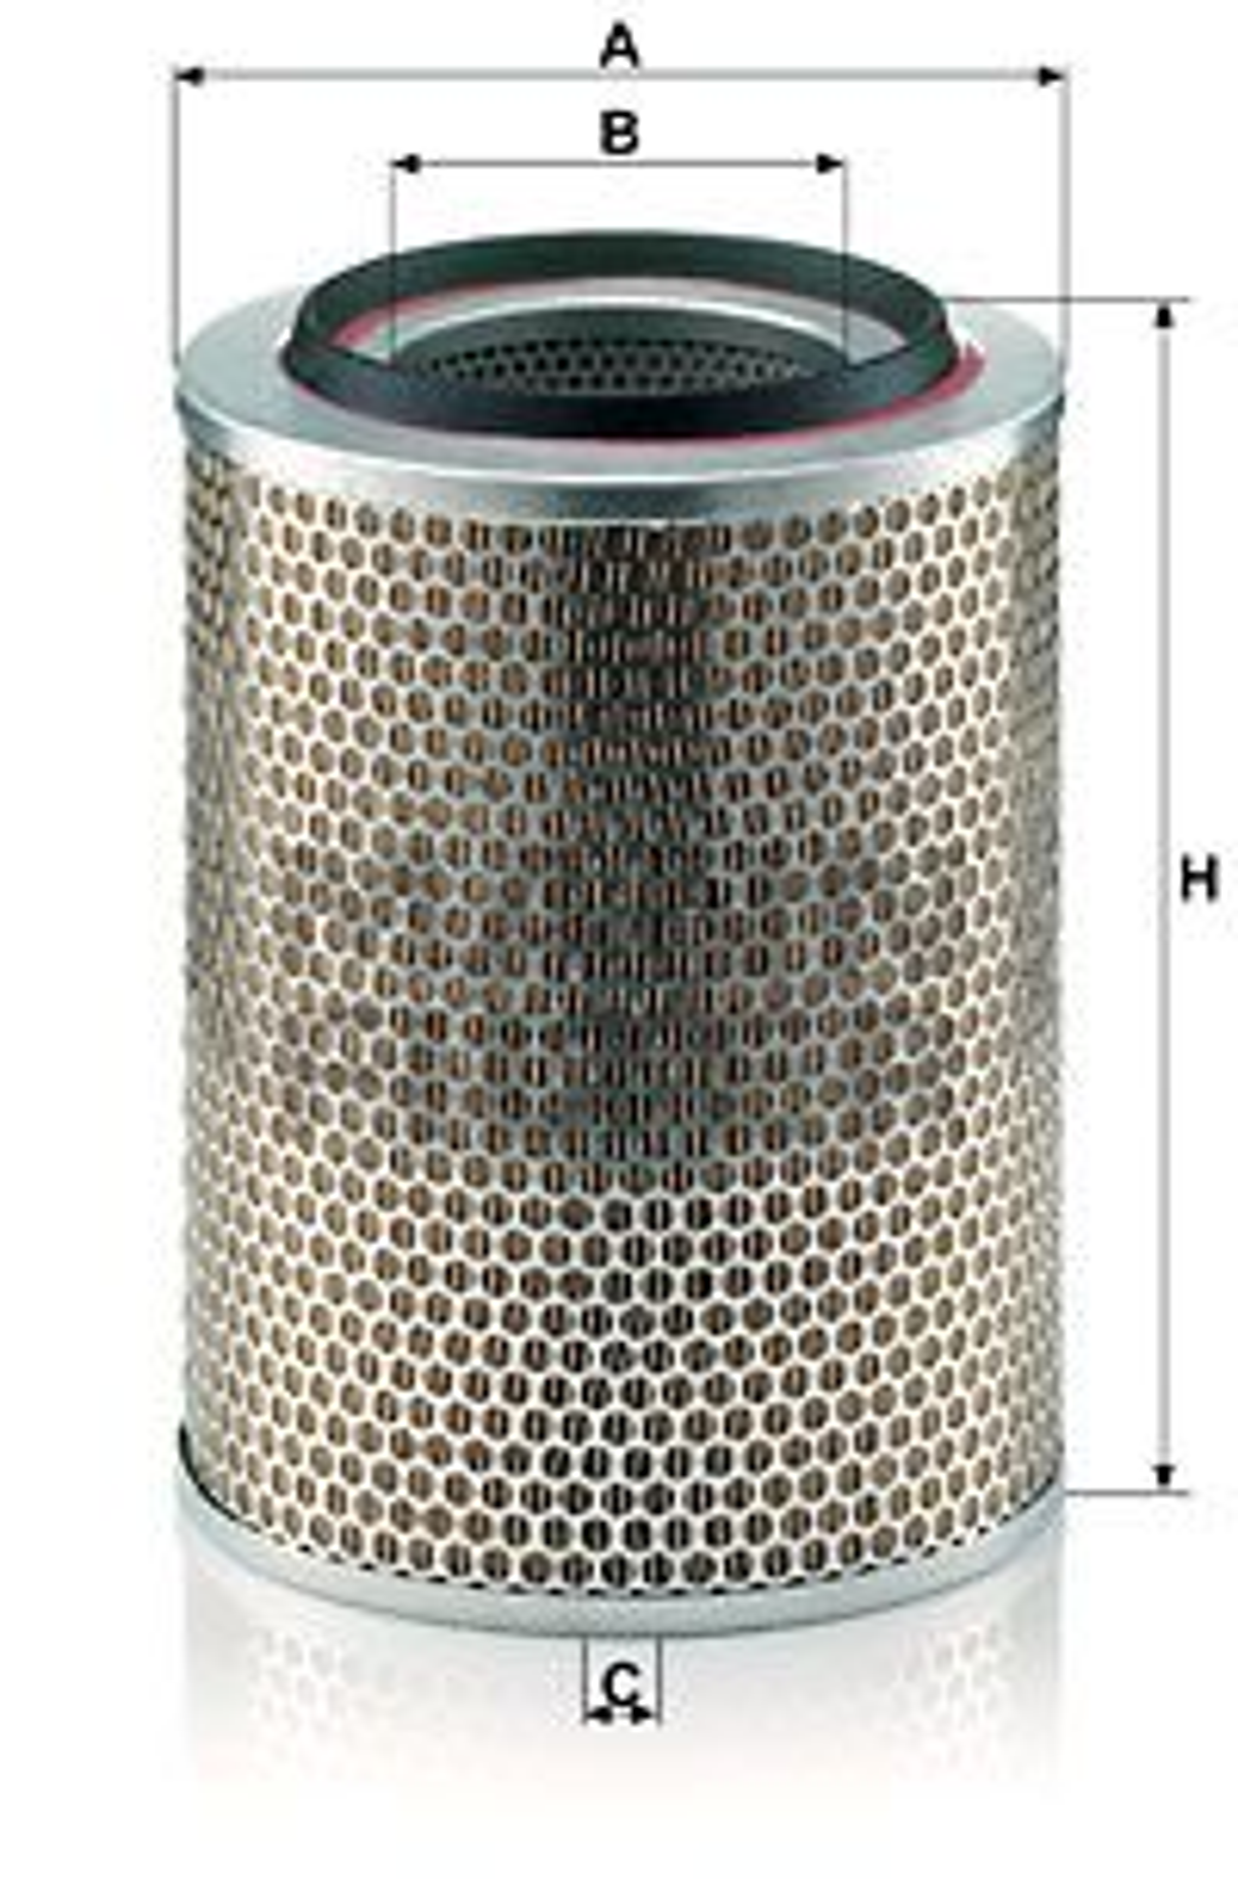 MANN-FILTER Filtr powietrza do IVECO - numer produktu: C 23 440/2